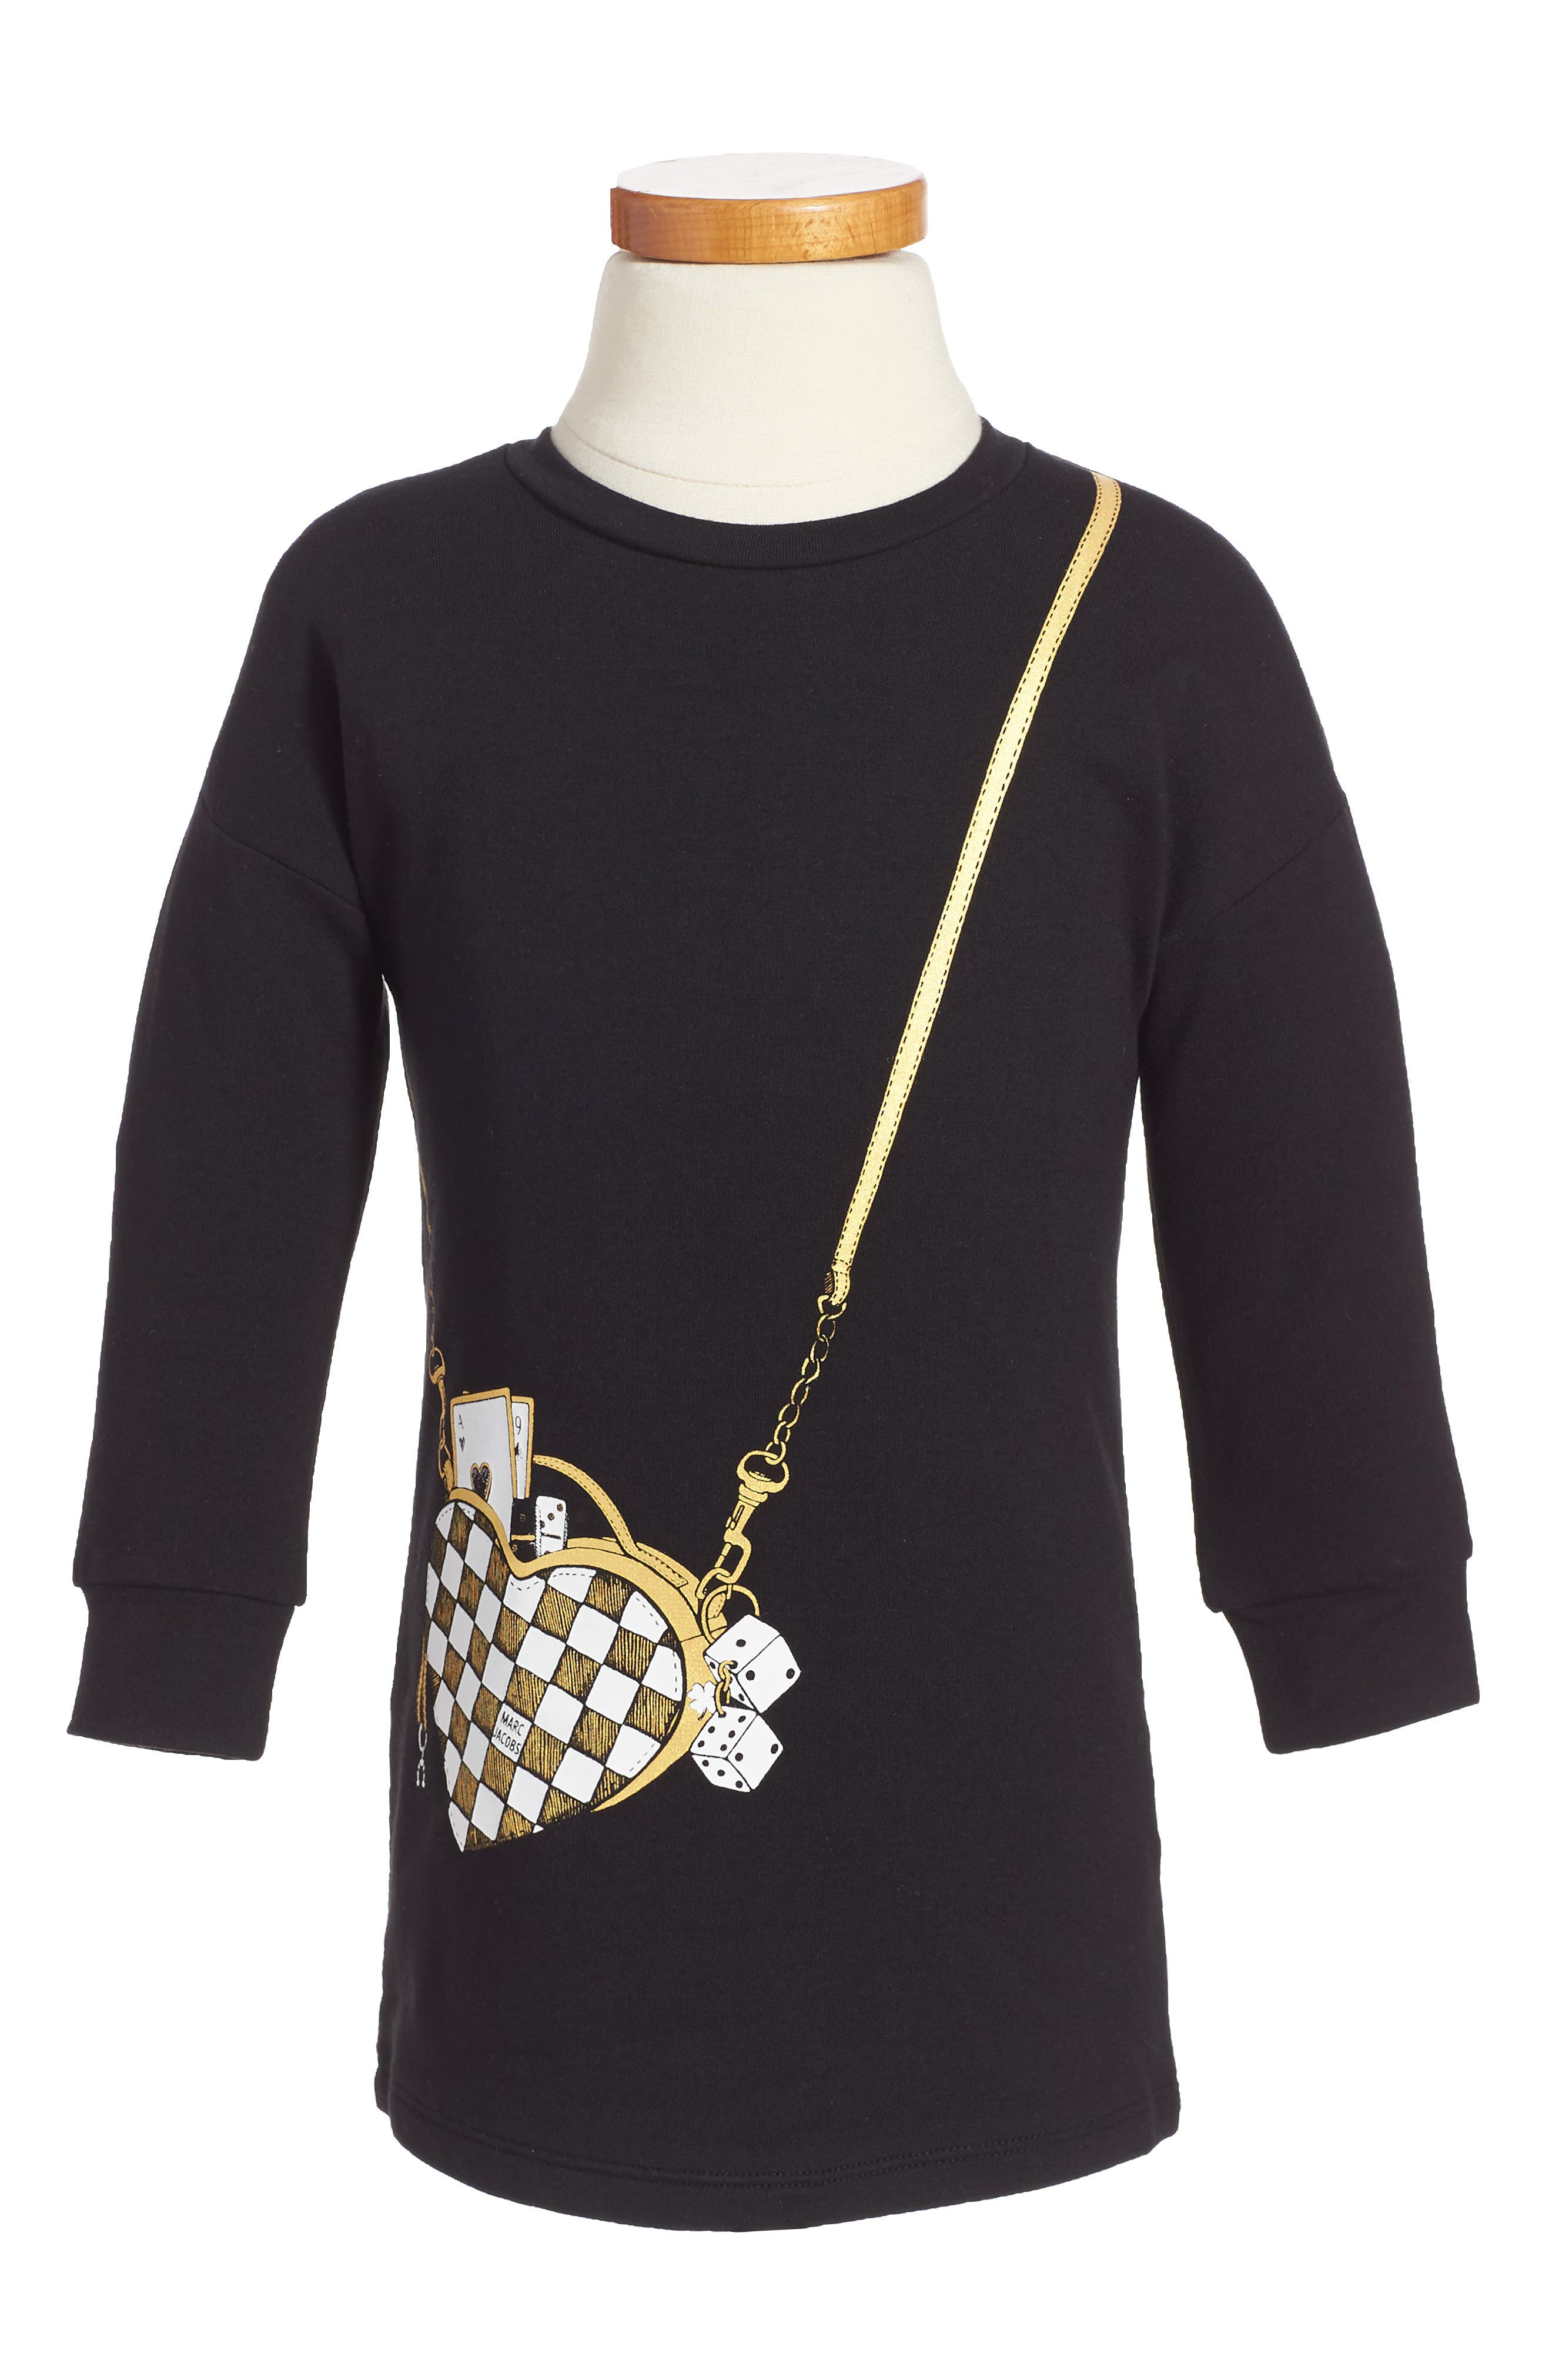 Trompe L'Oeil Sweatshirt Dress,                             Main thumbnail 1, color,                             Black